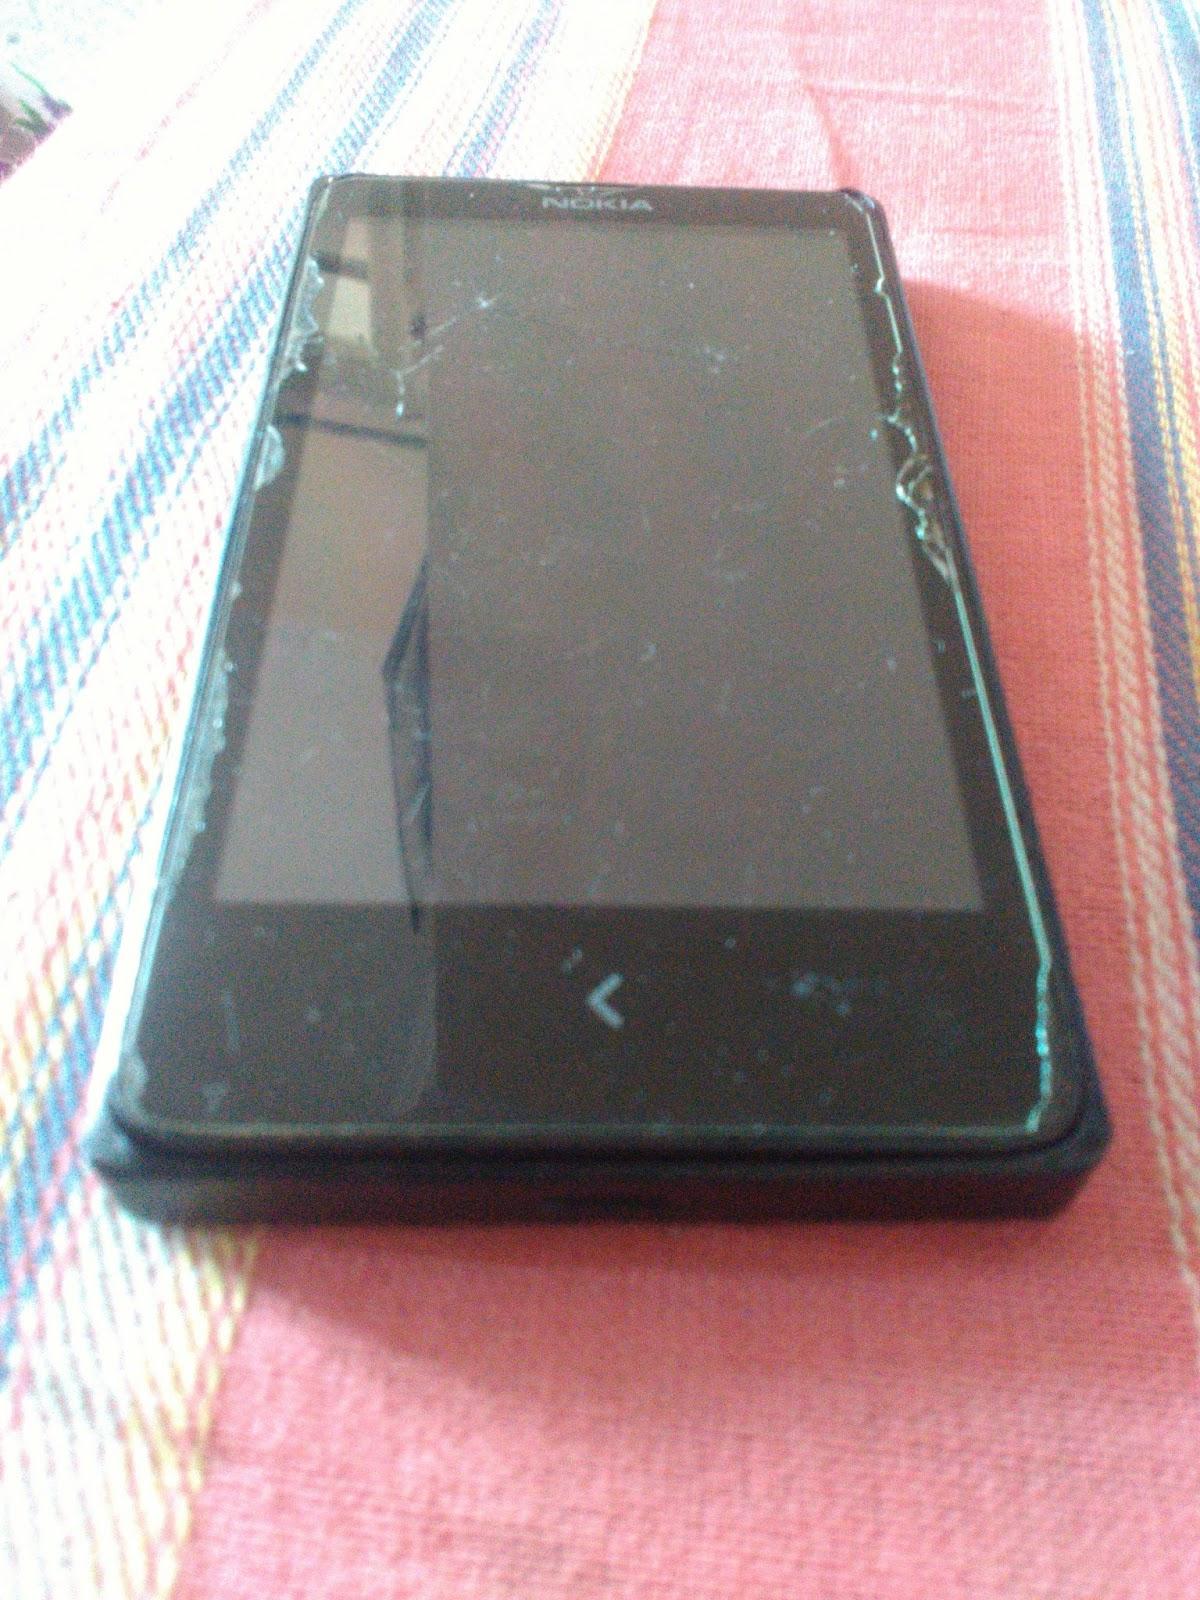 Installing GApps on Nokia X